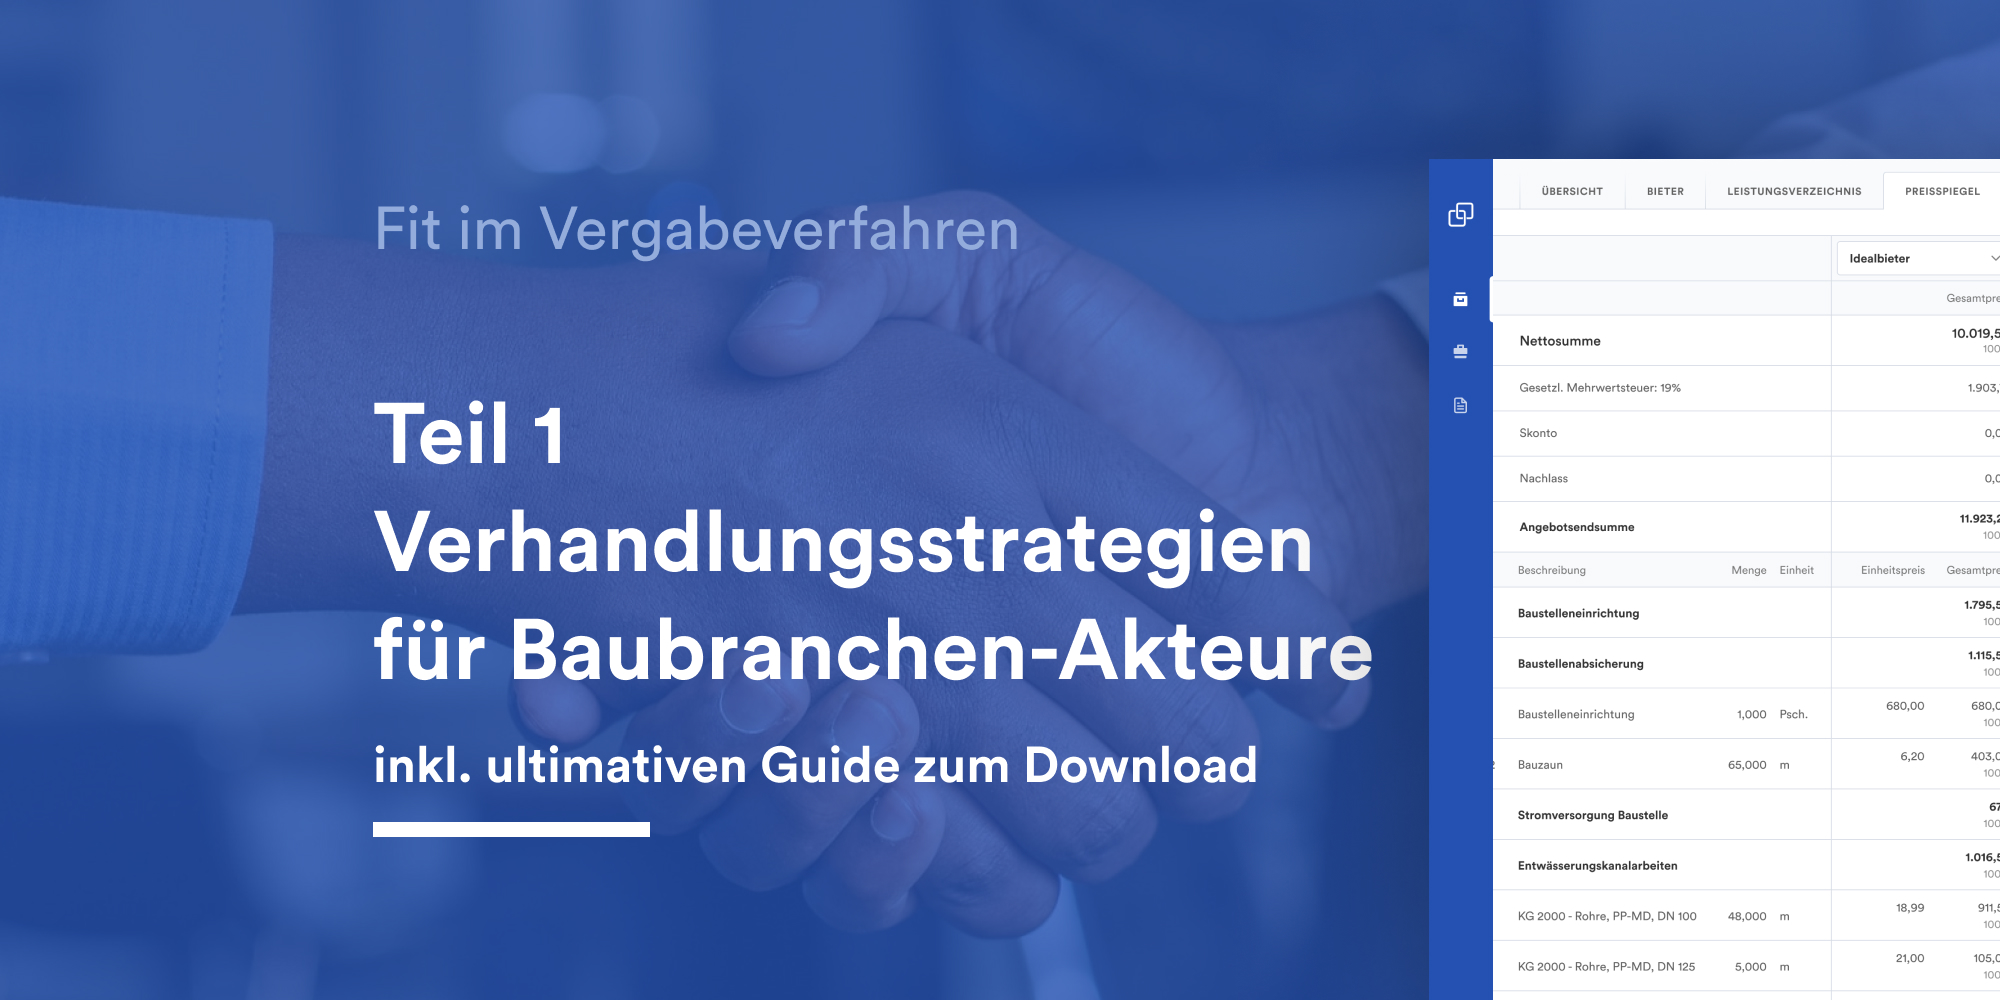 Verhandlungsstrategien für Baubranchen-Akteure inkl. ultimativen Guide zum Download